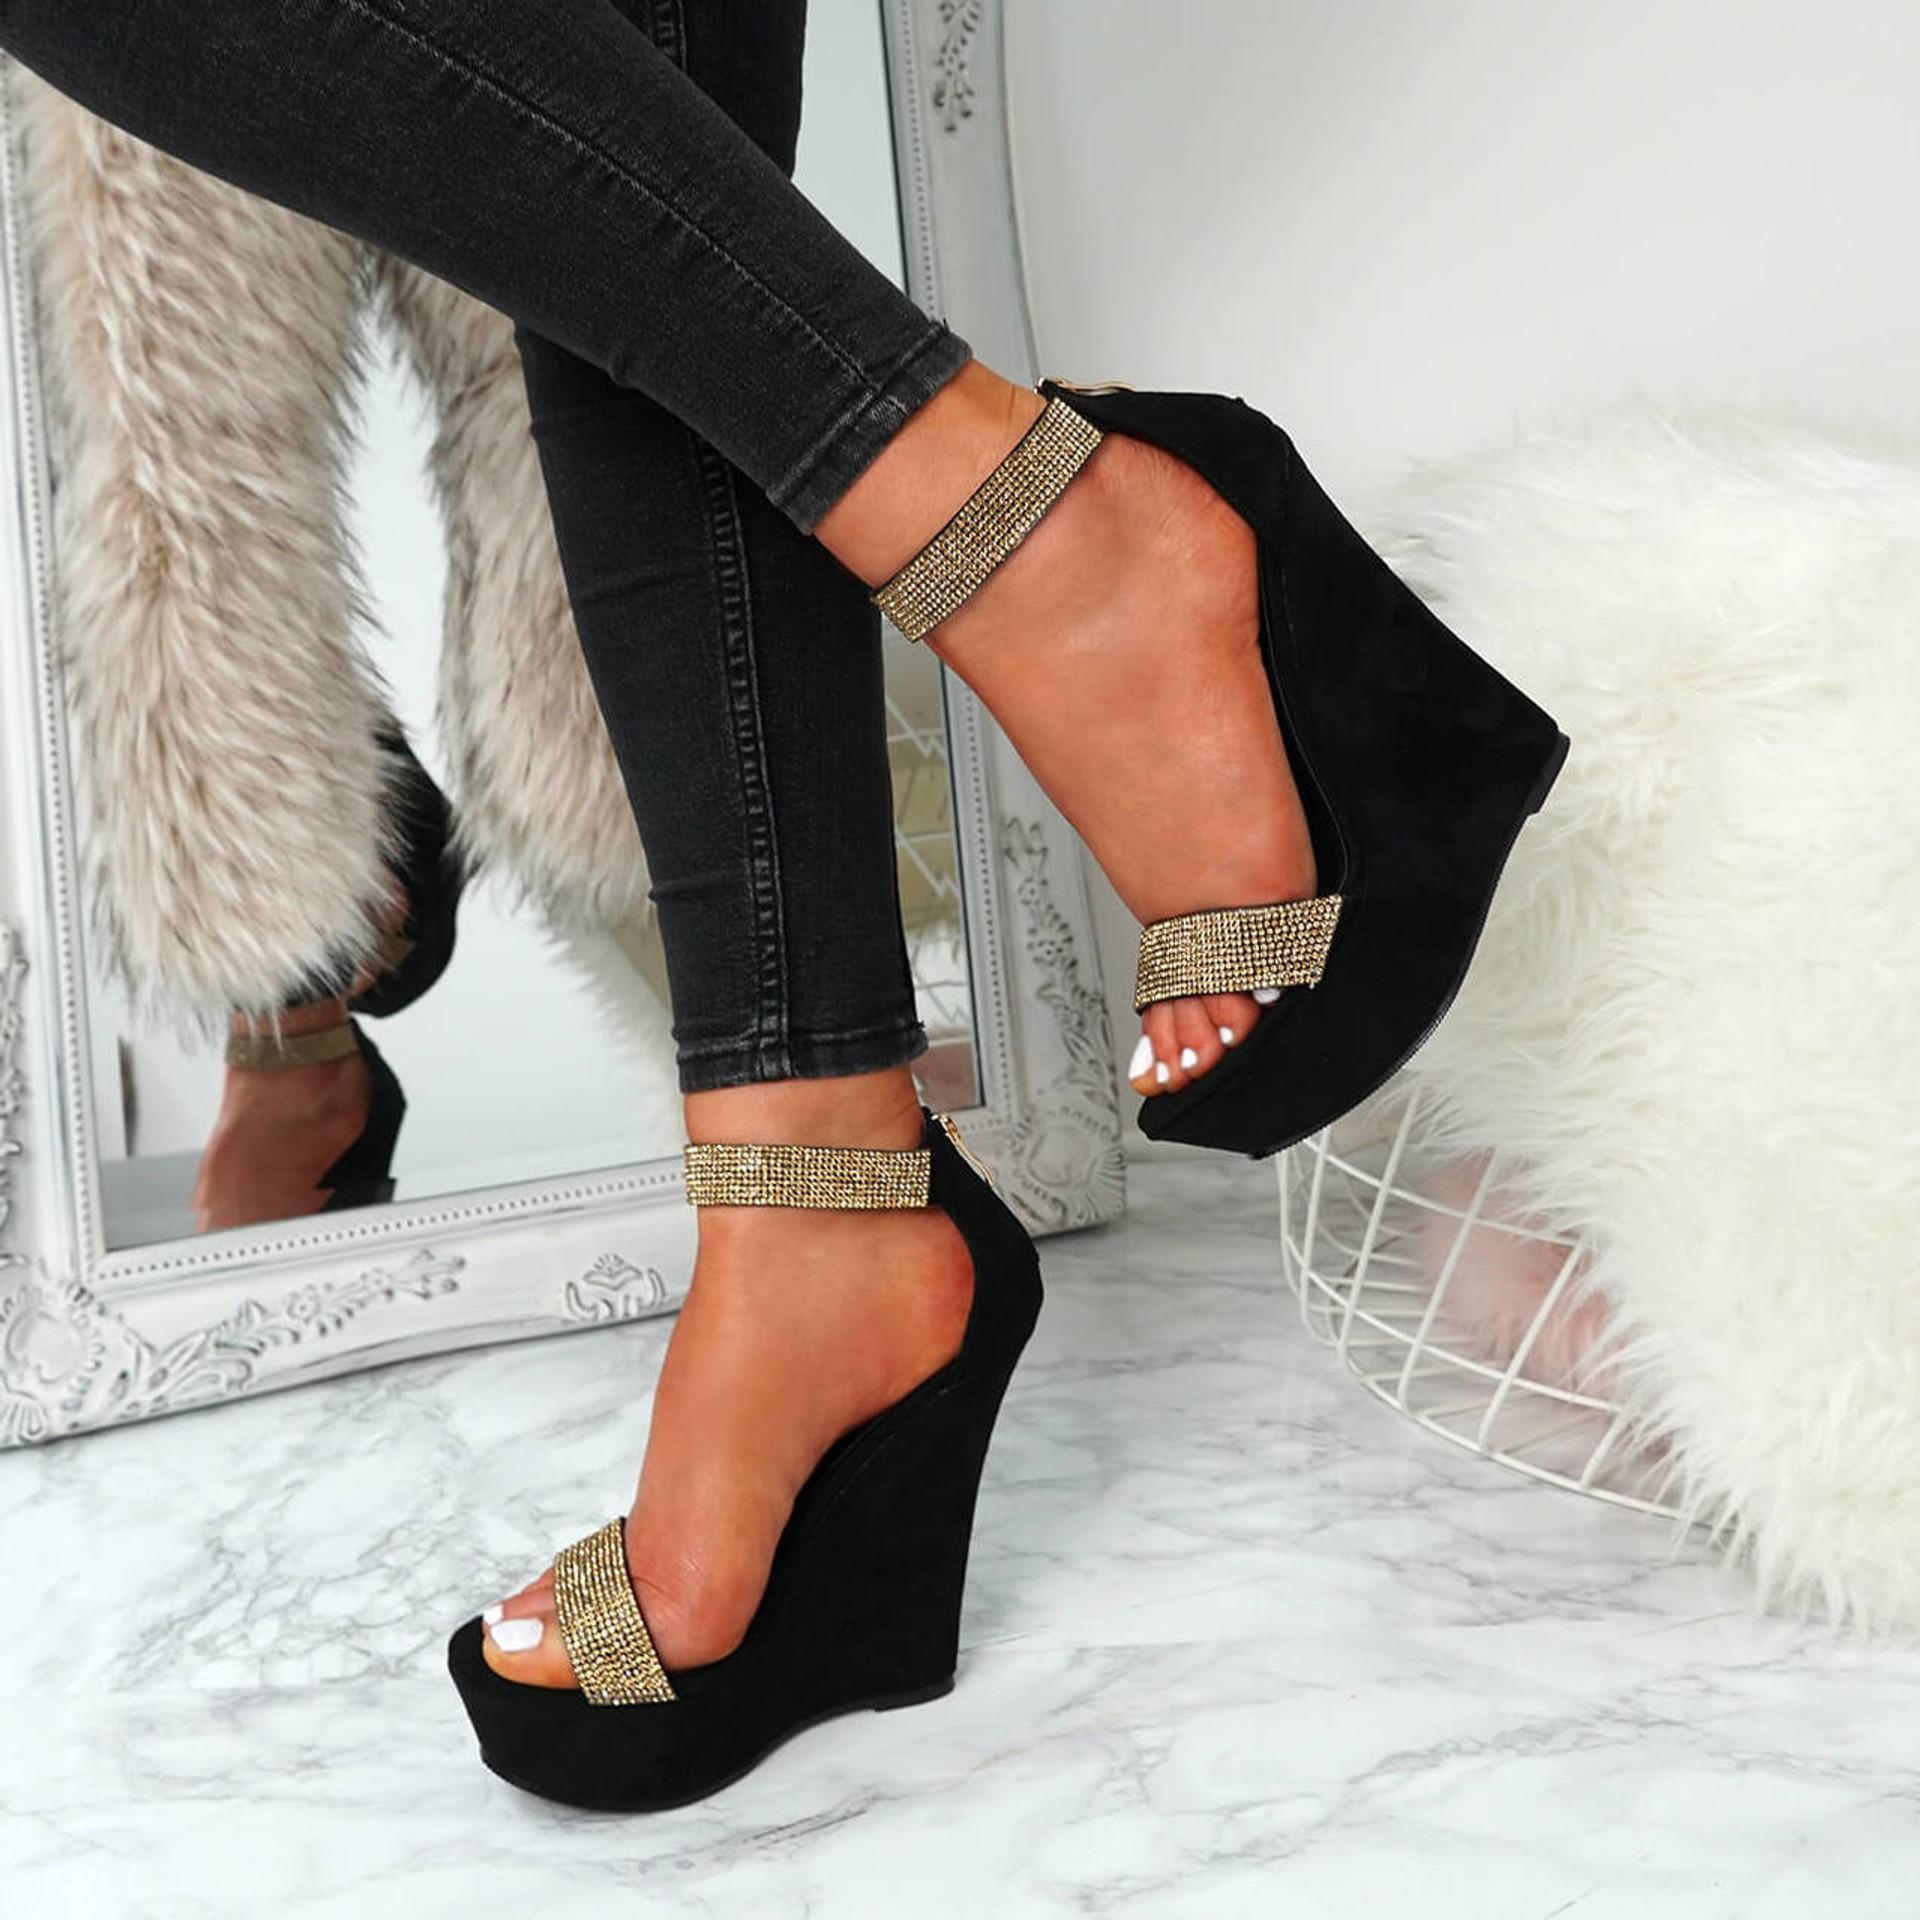 Klana Black Diamante Studded Sandals